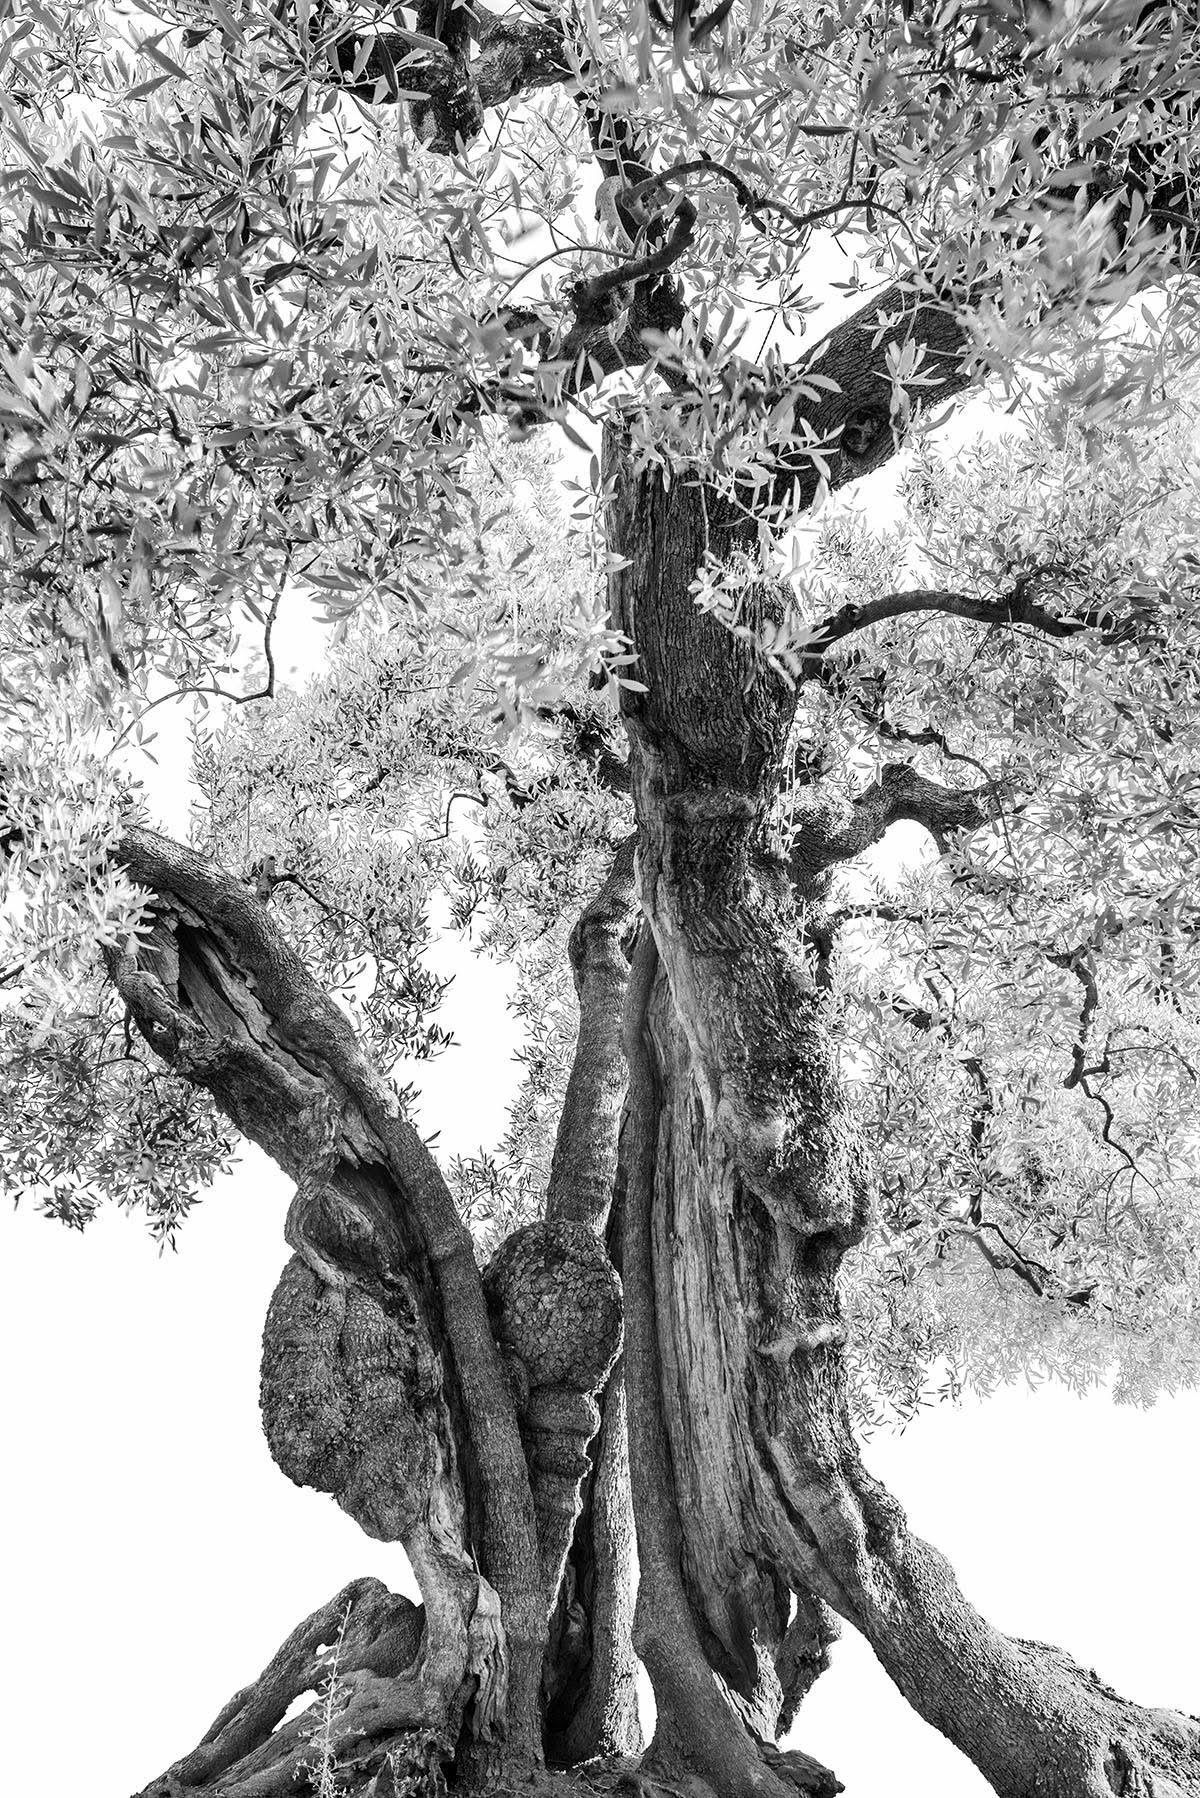 martin-ogolter-Monumentali-nature-landscape-photographer-12